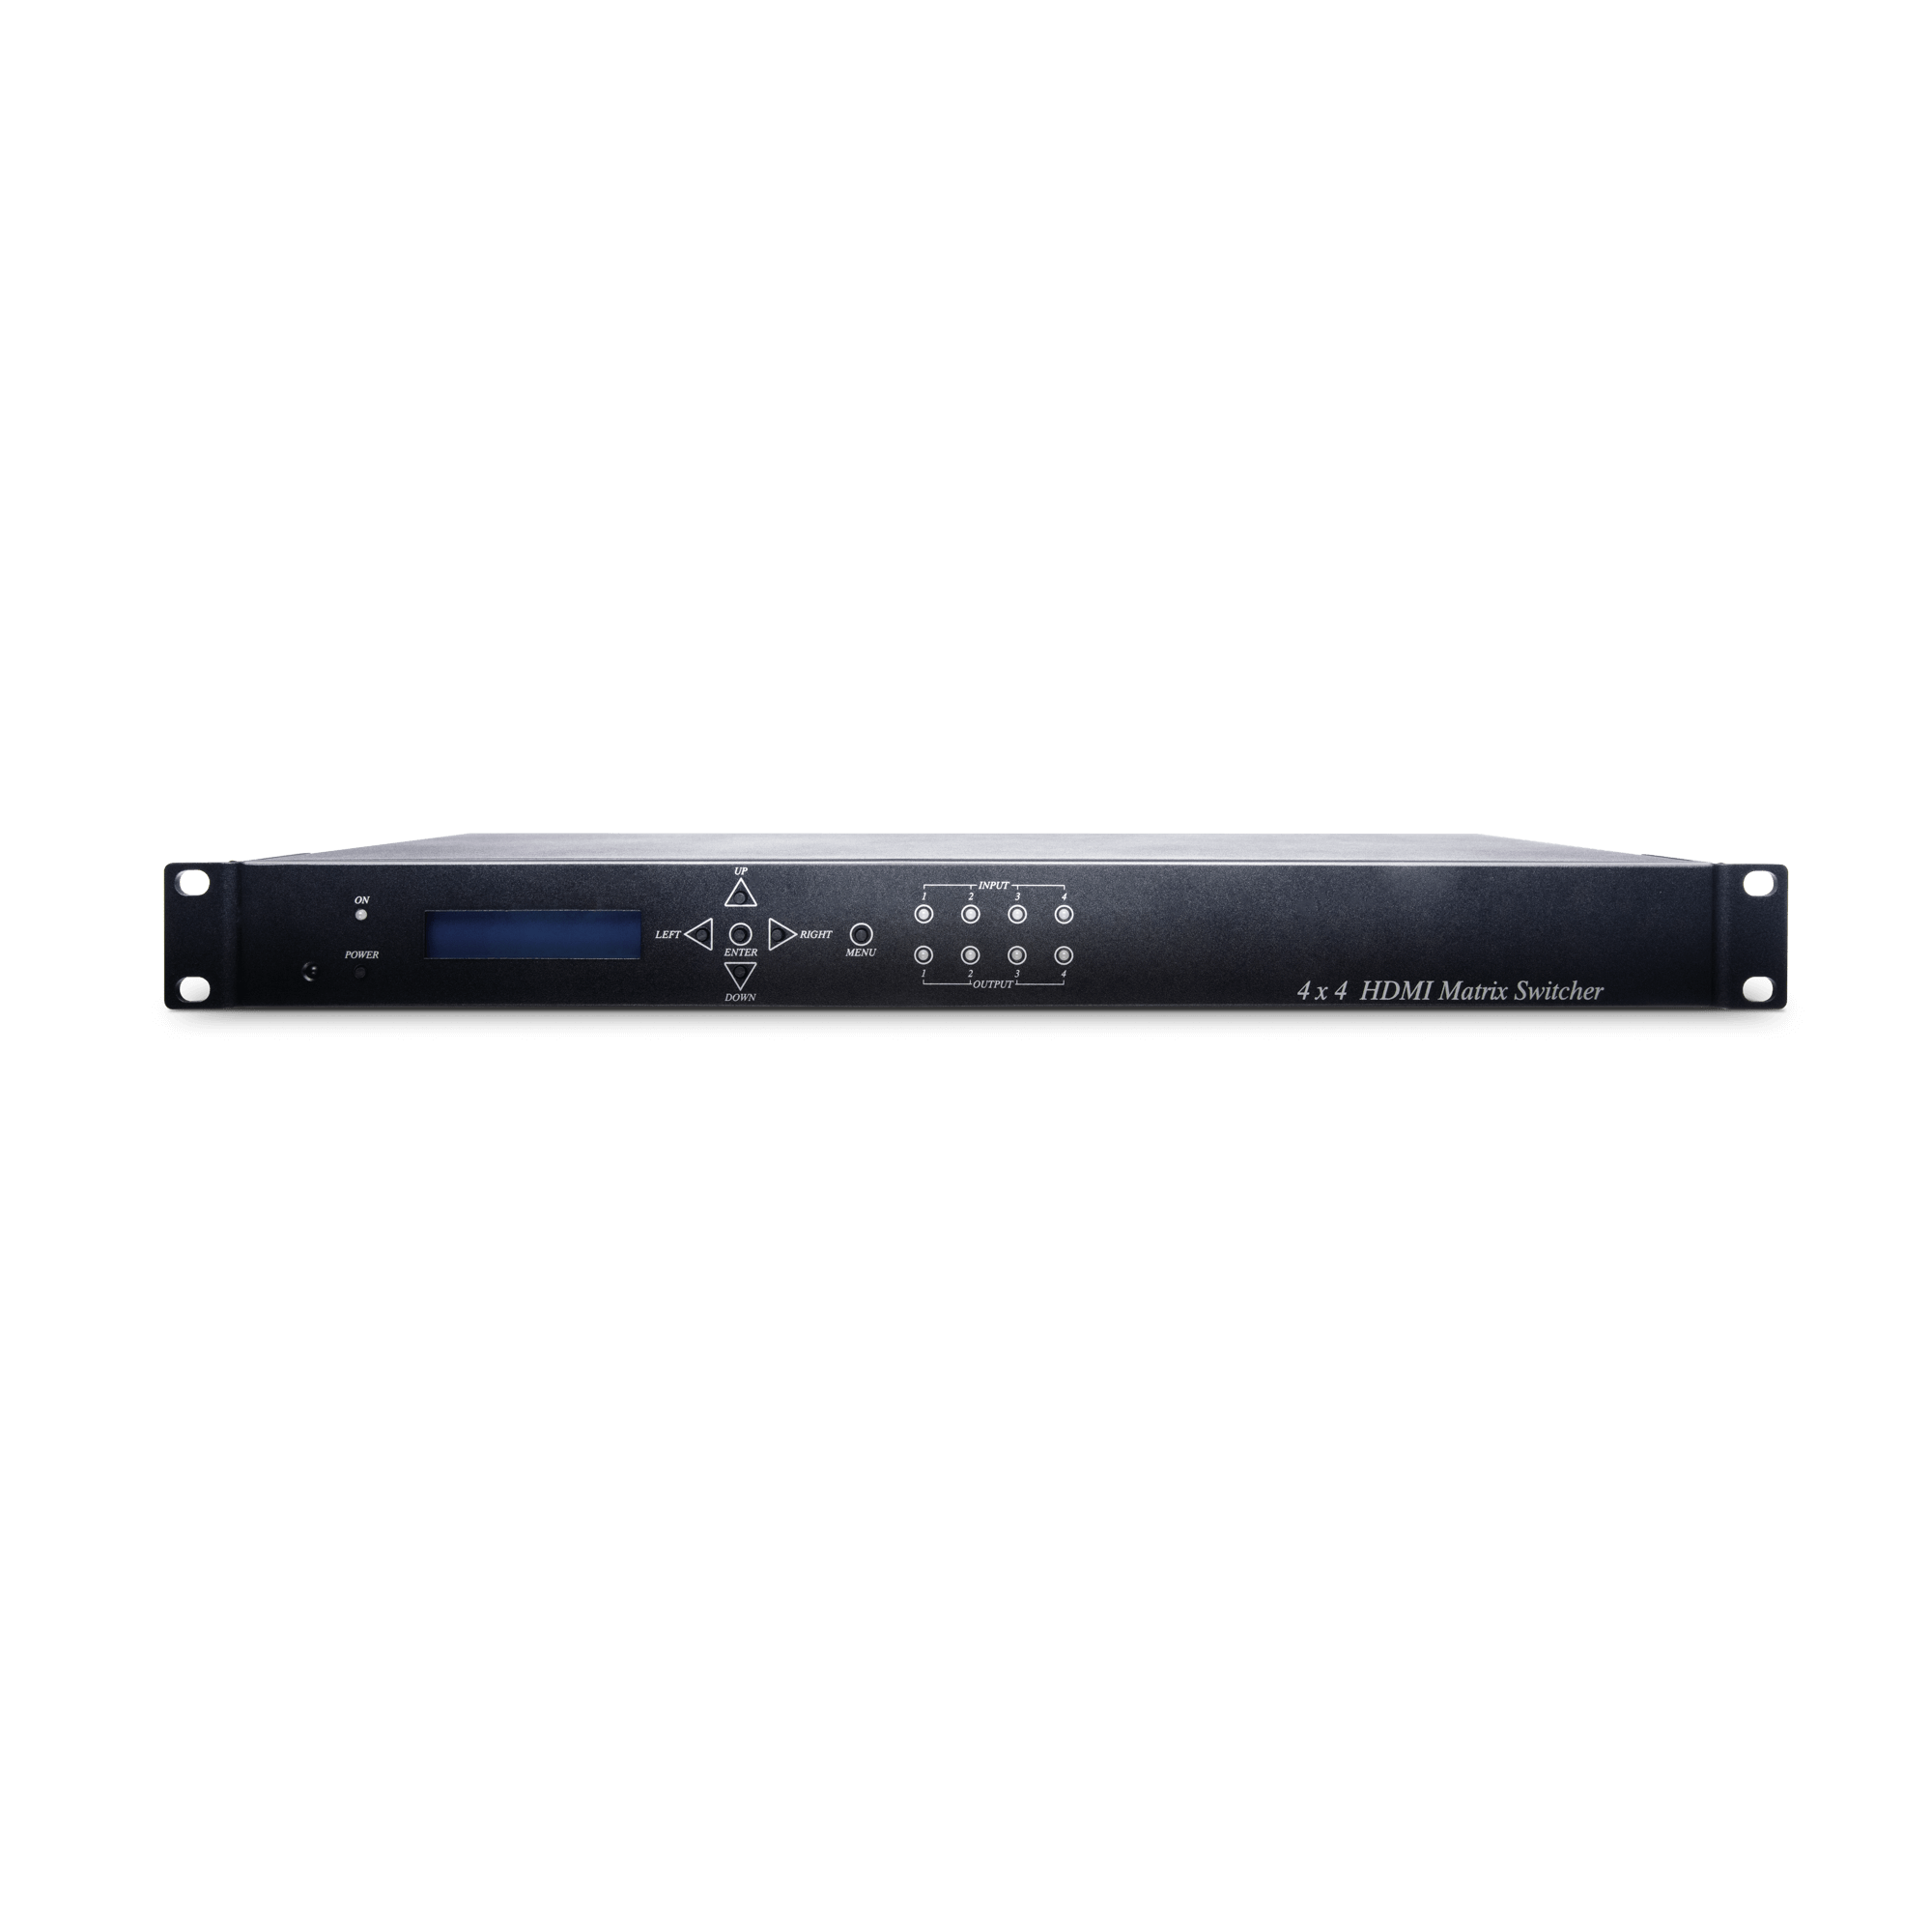 4 X 4 HDMI Matrix Switcher with Ethernet Control